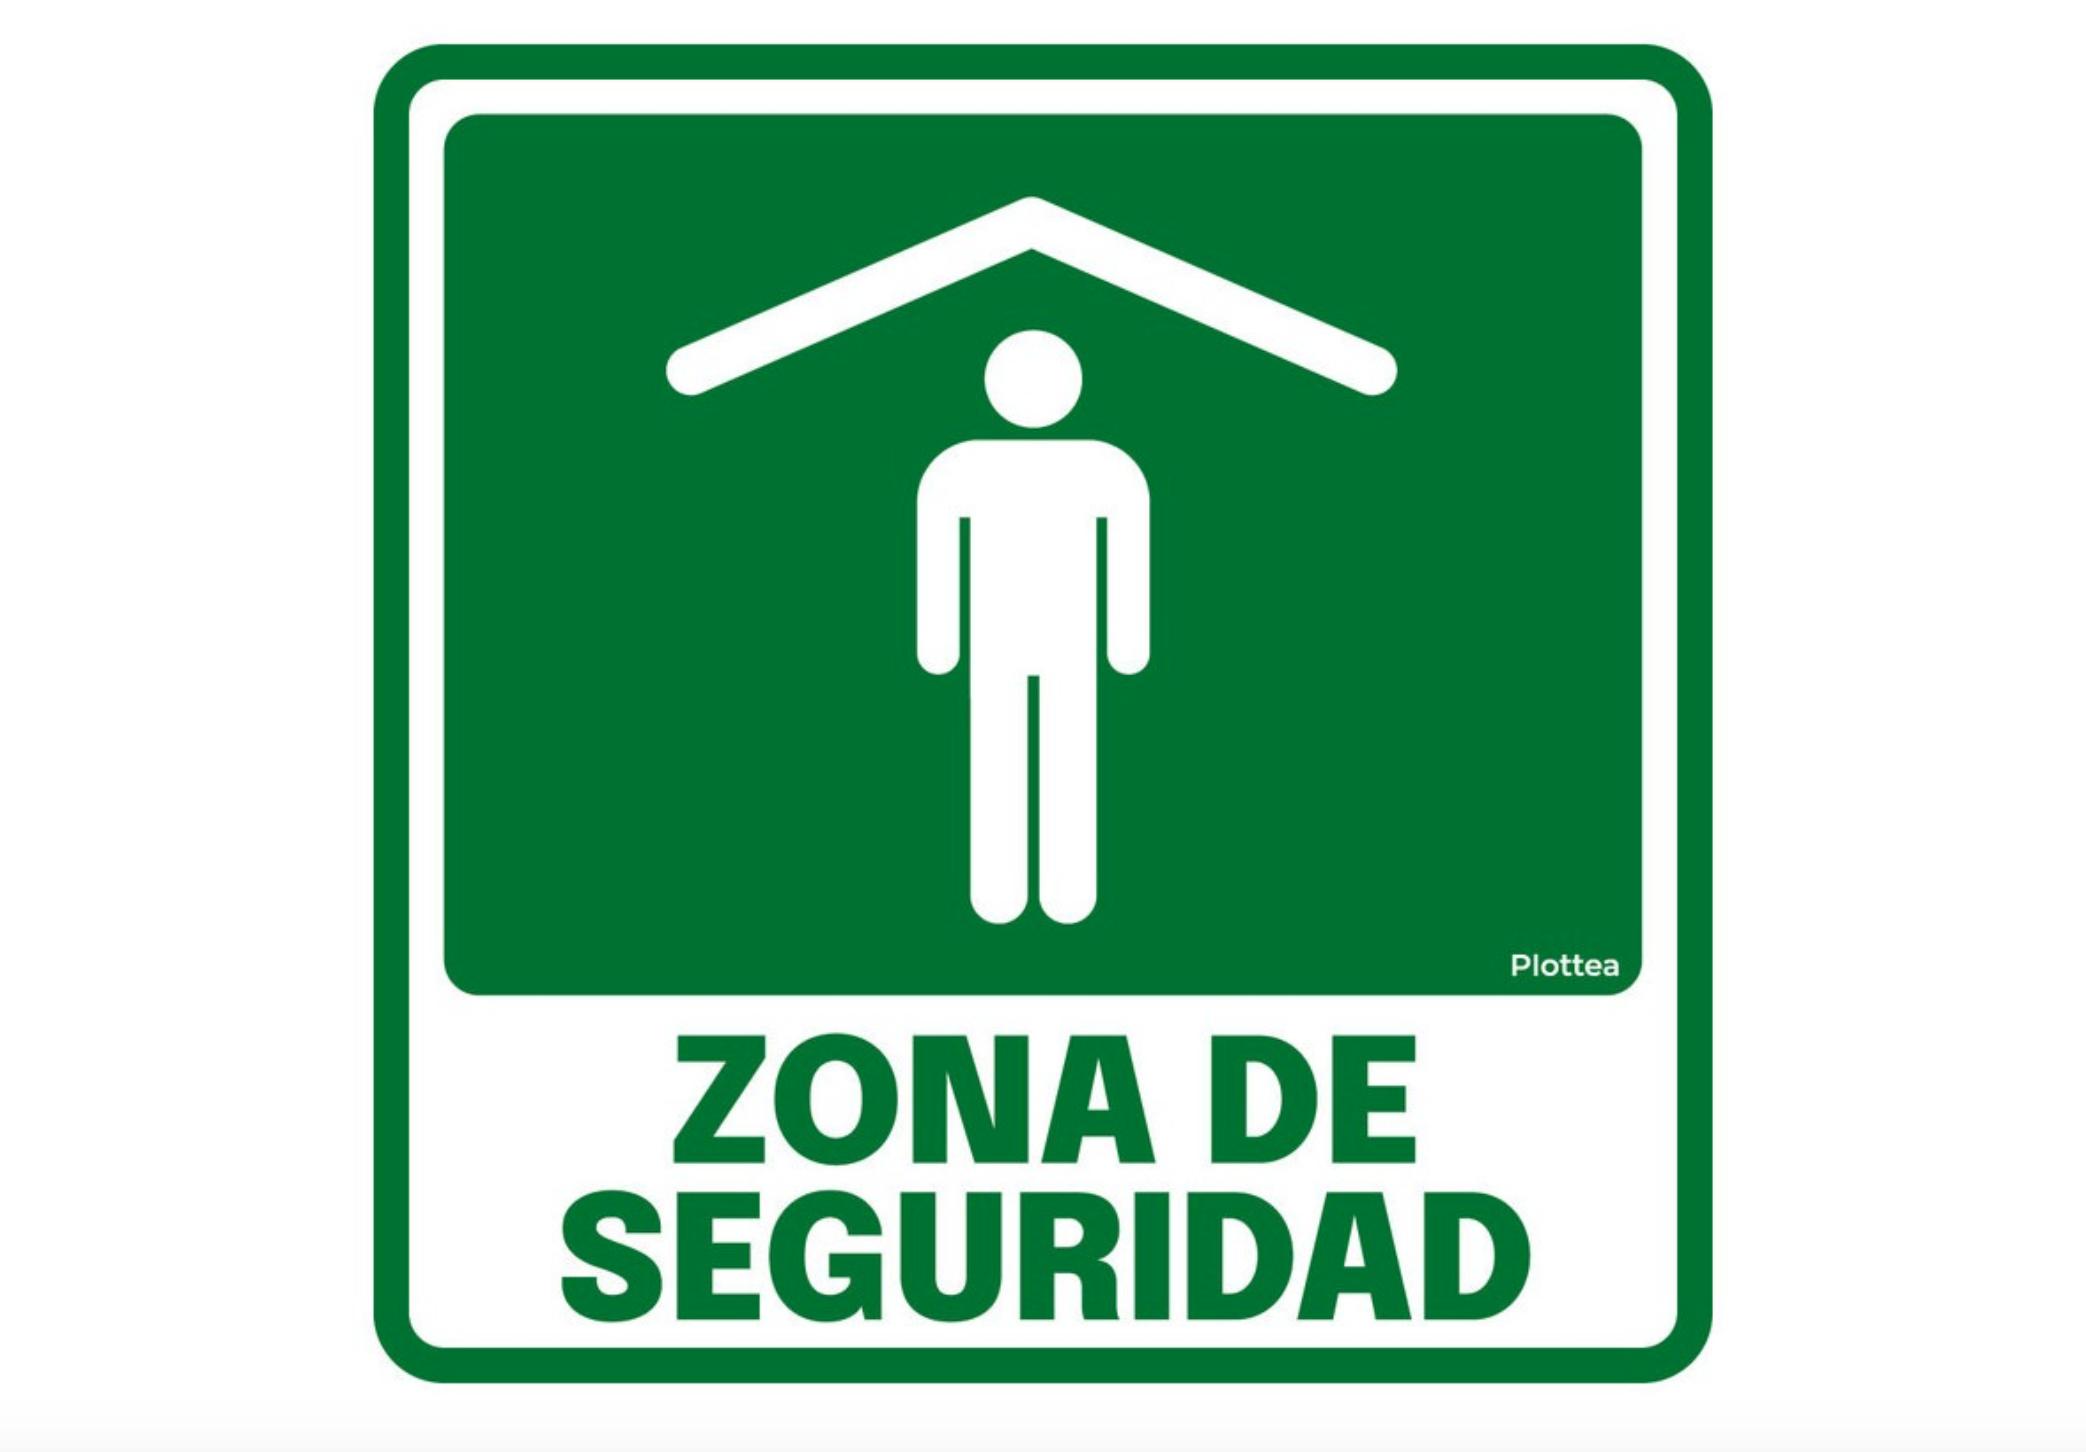 cuales-son-las-zonas-mas-seguras-dentro-de-tu-hogar-en-caso-de-sismo-alt